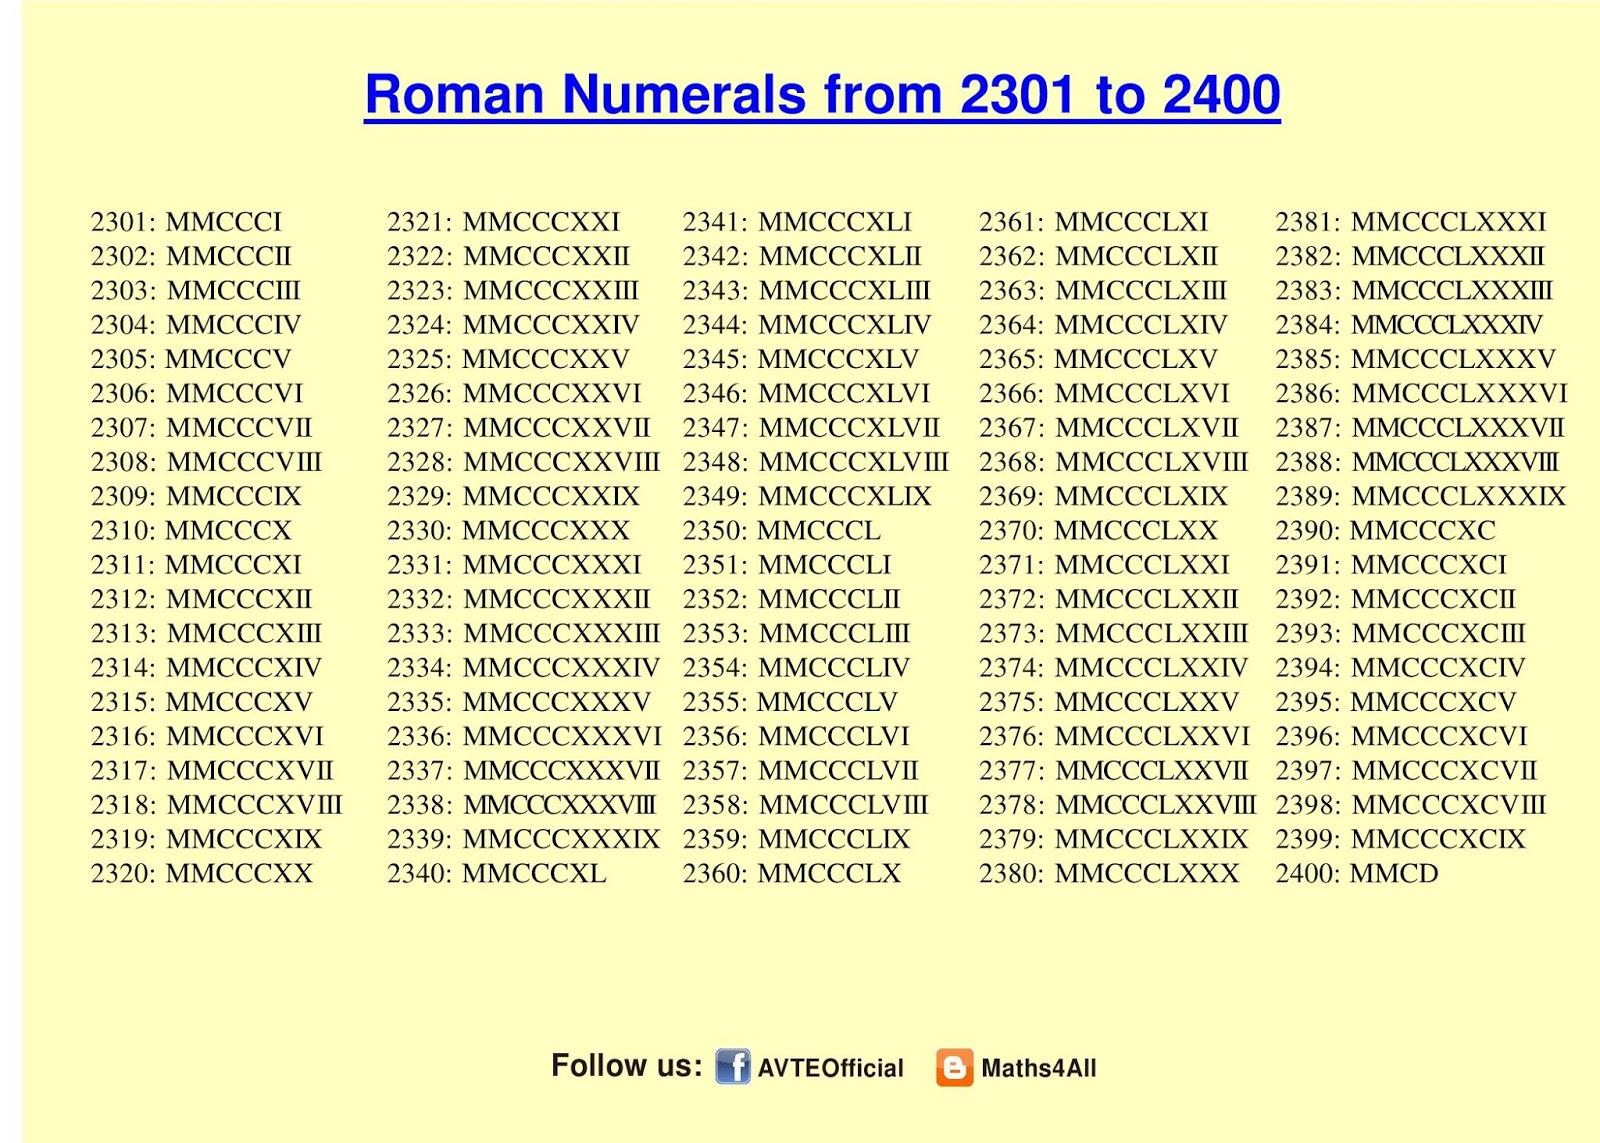 Workbooks worksheets on roman numerals : Maths4all: ROMAN NUMERALS 2301 TO 2400